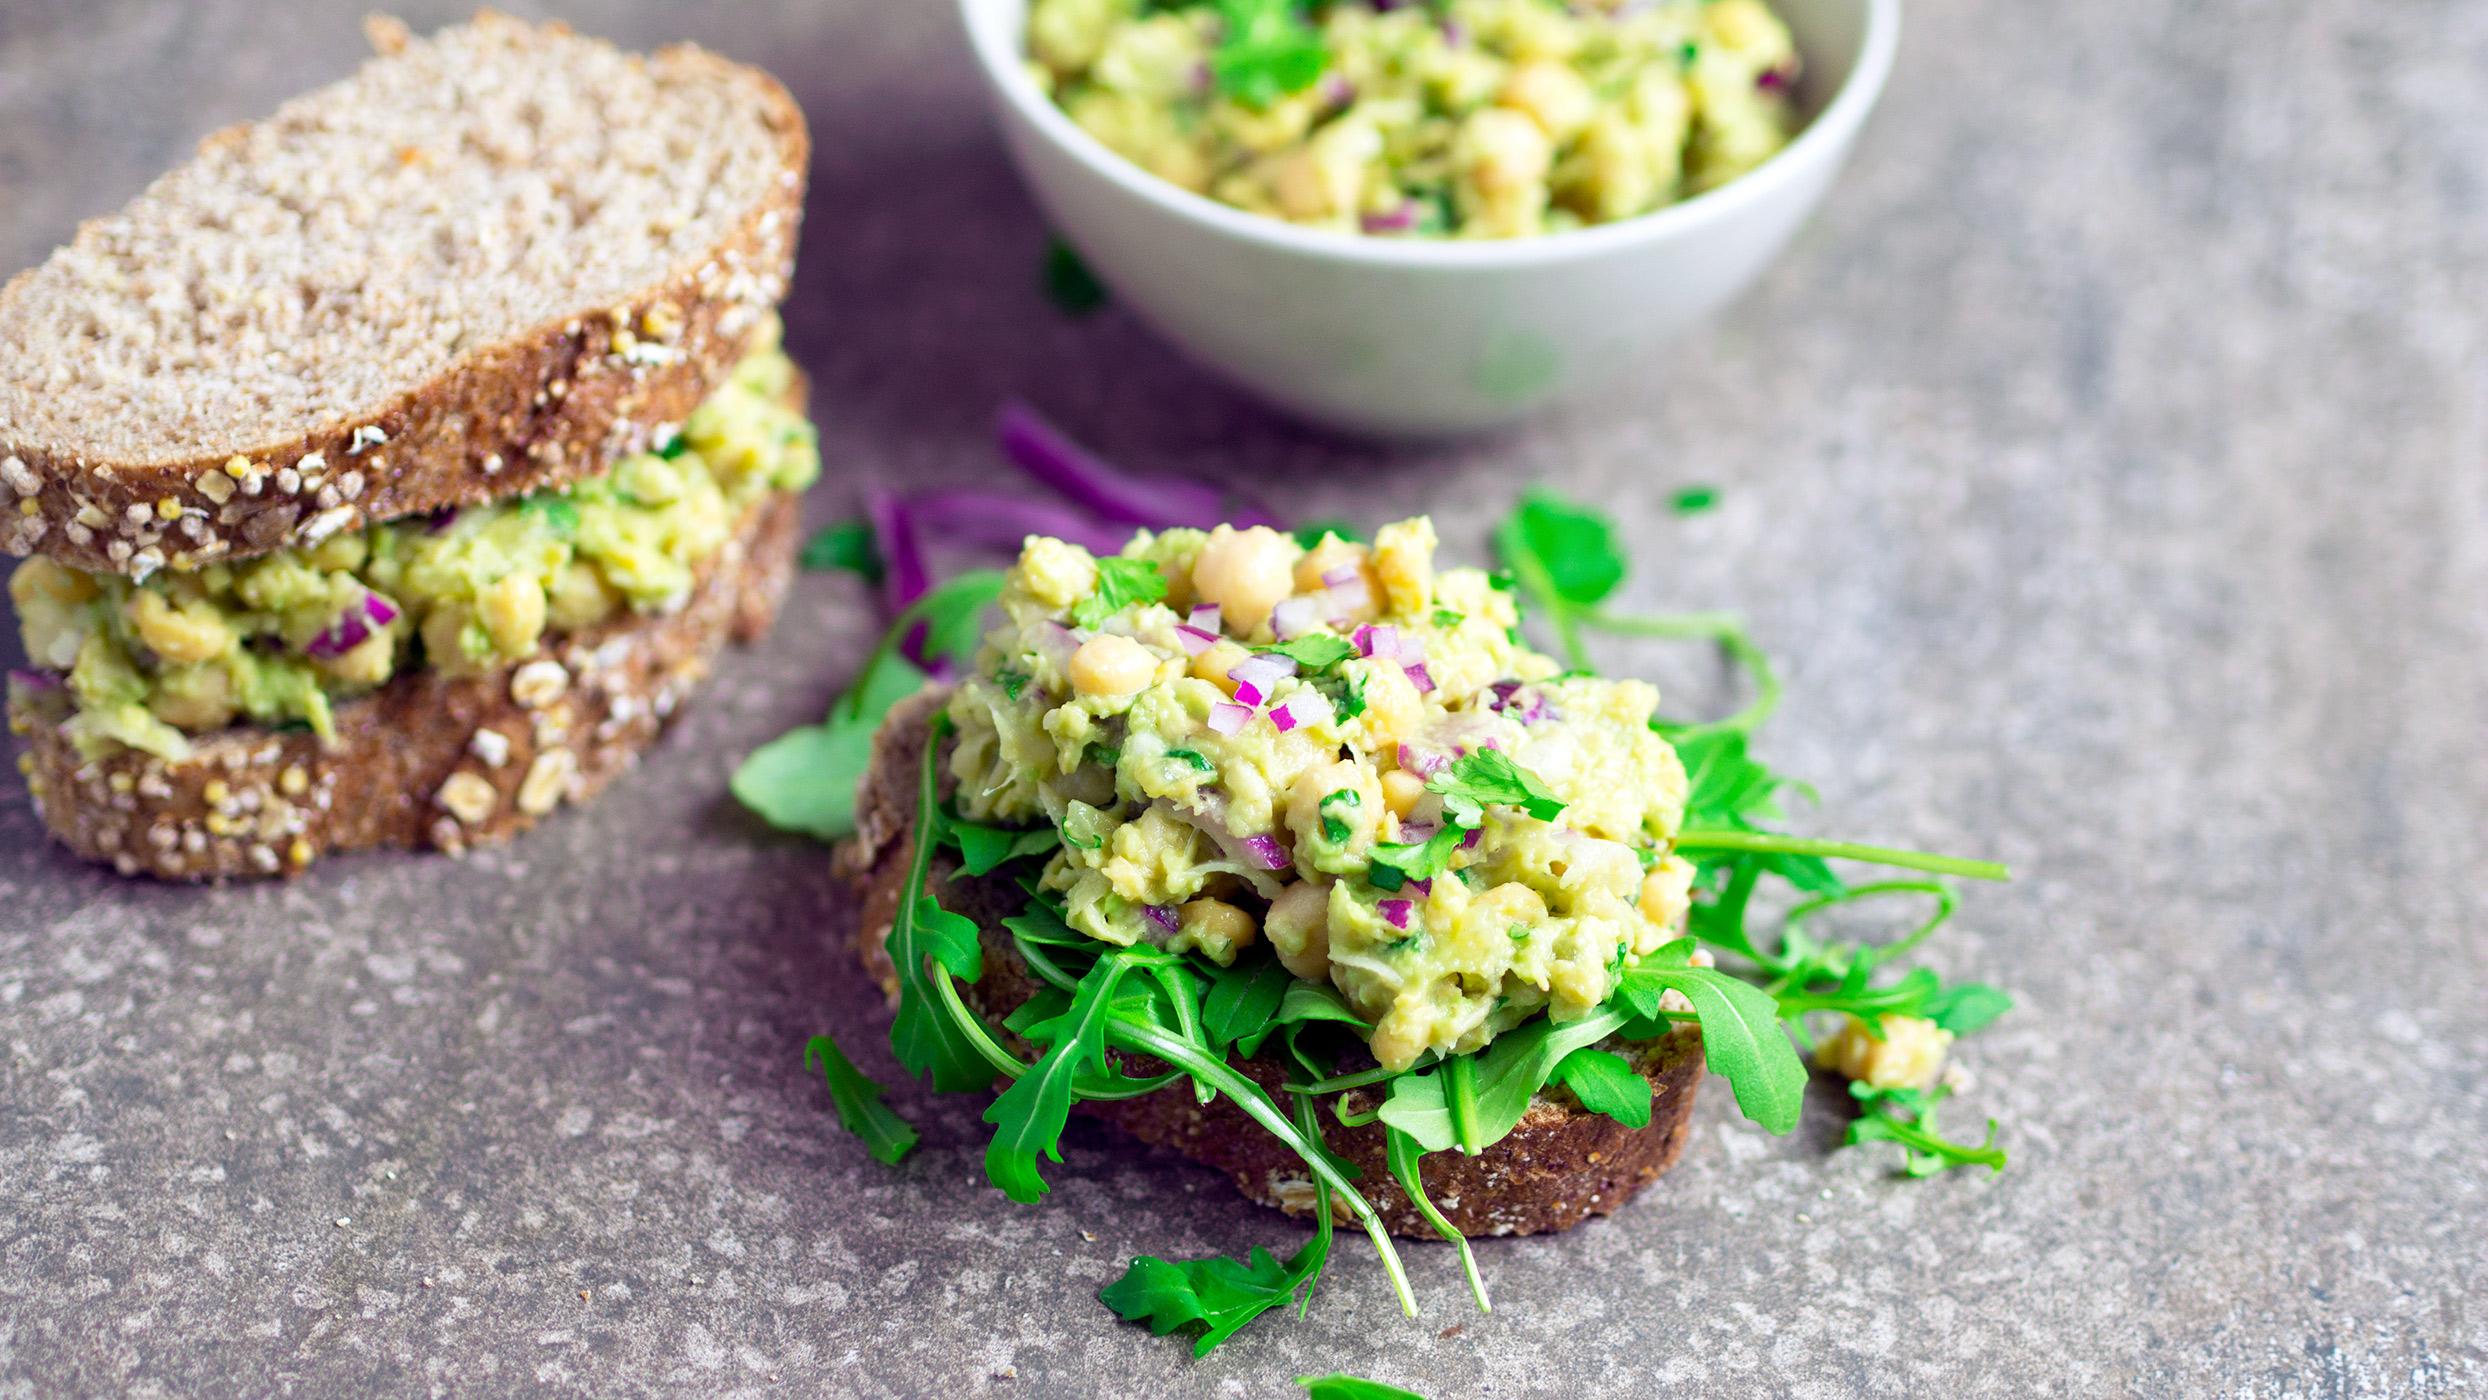 Vegan recipe video: Here's how to make chickpea avocado sandwiches